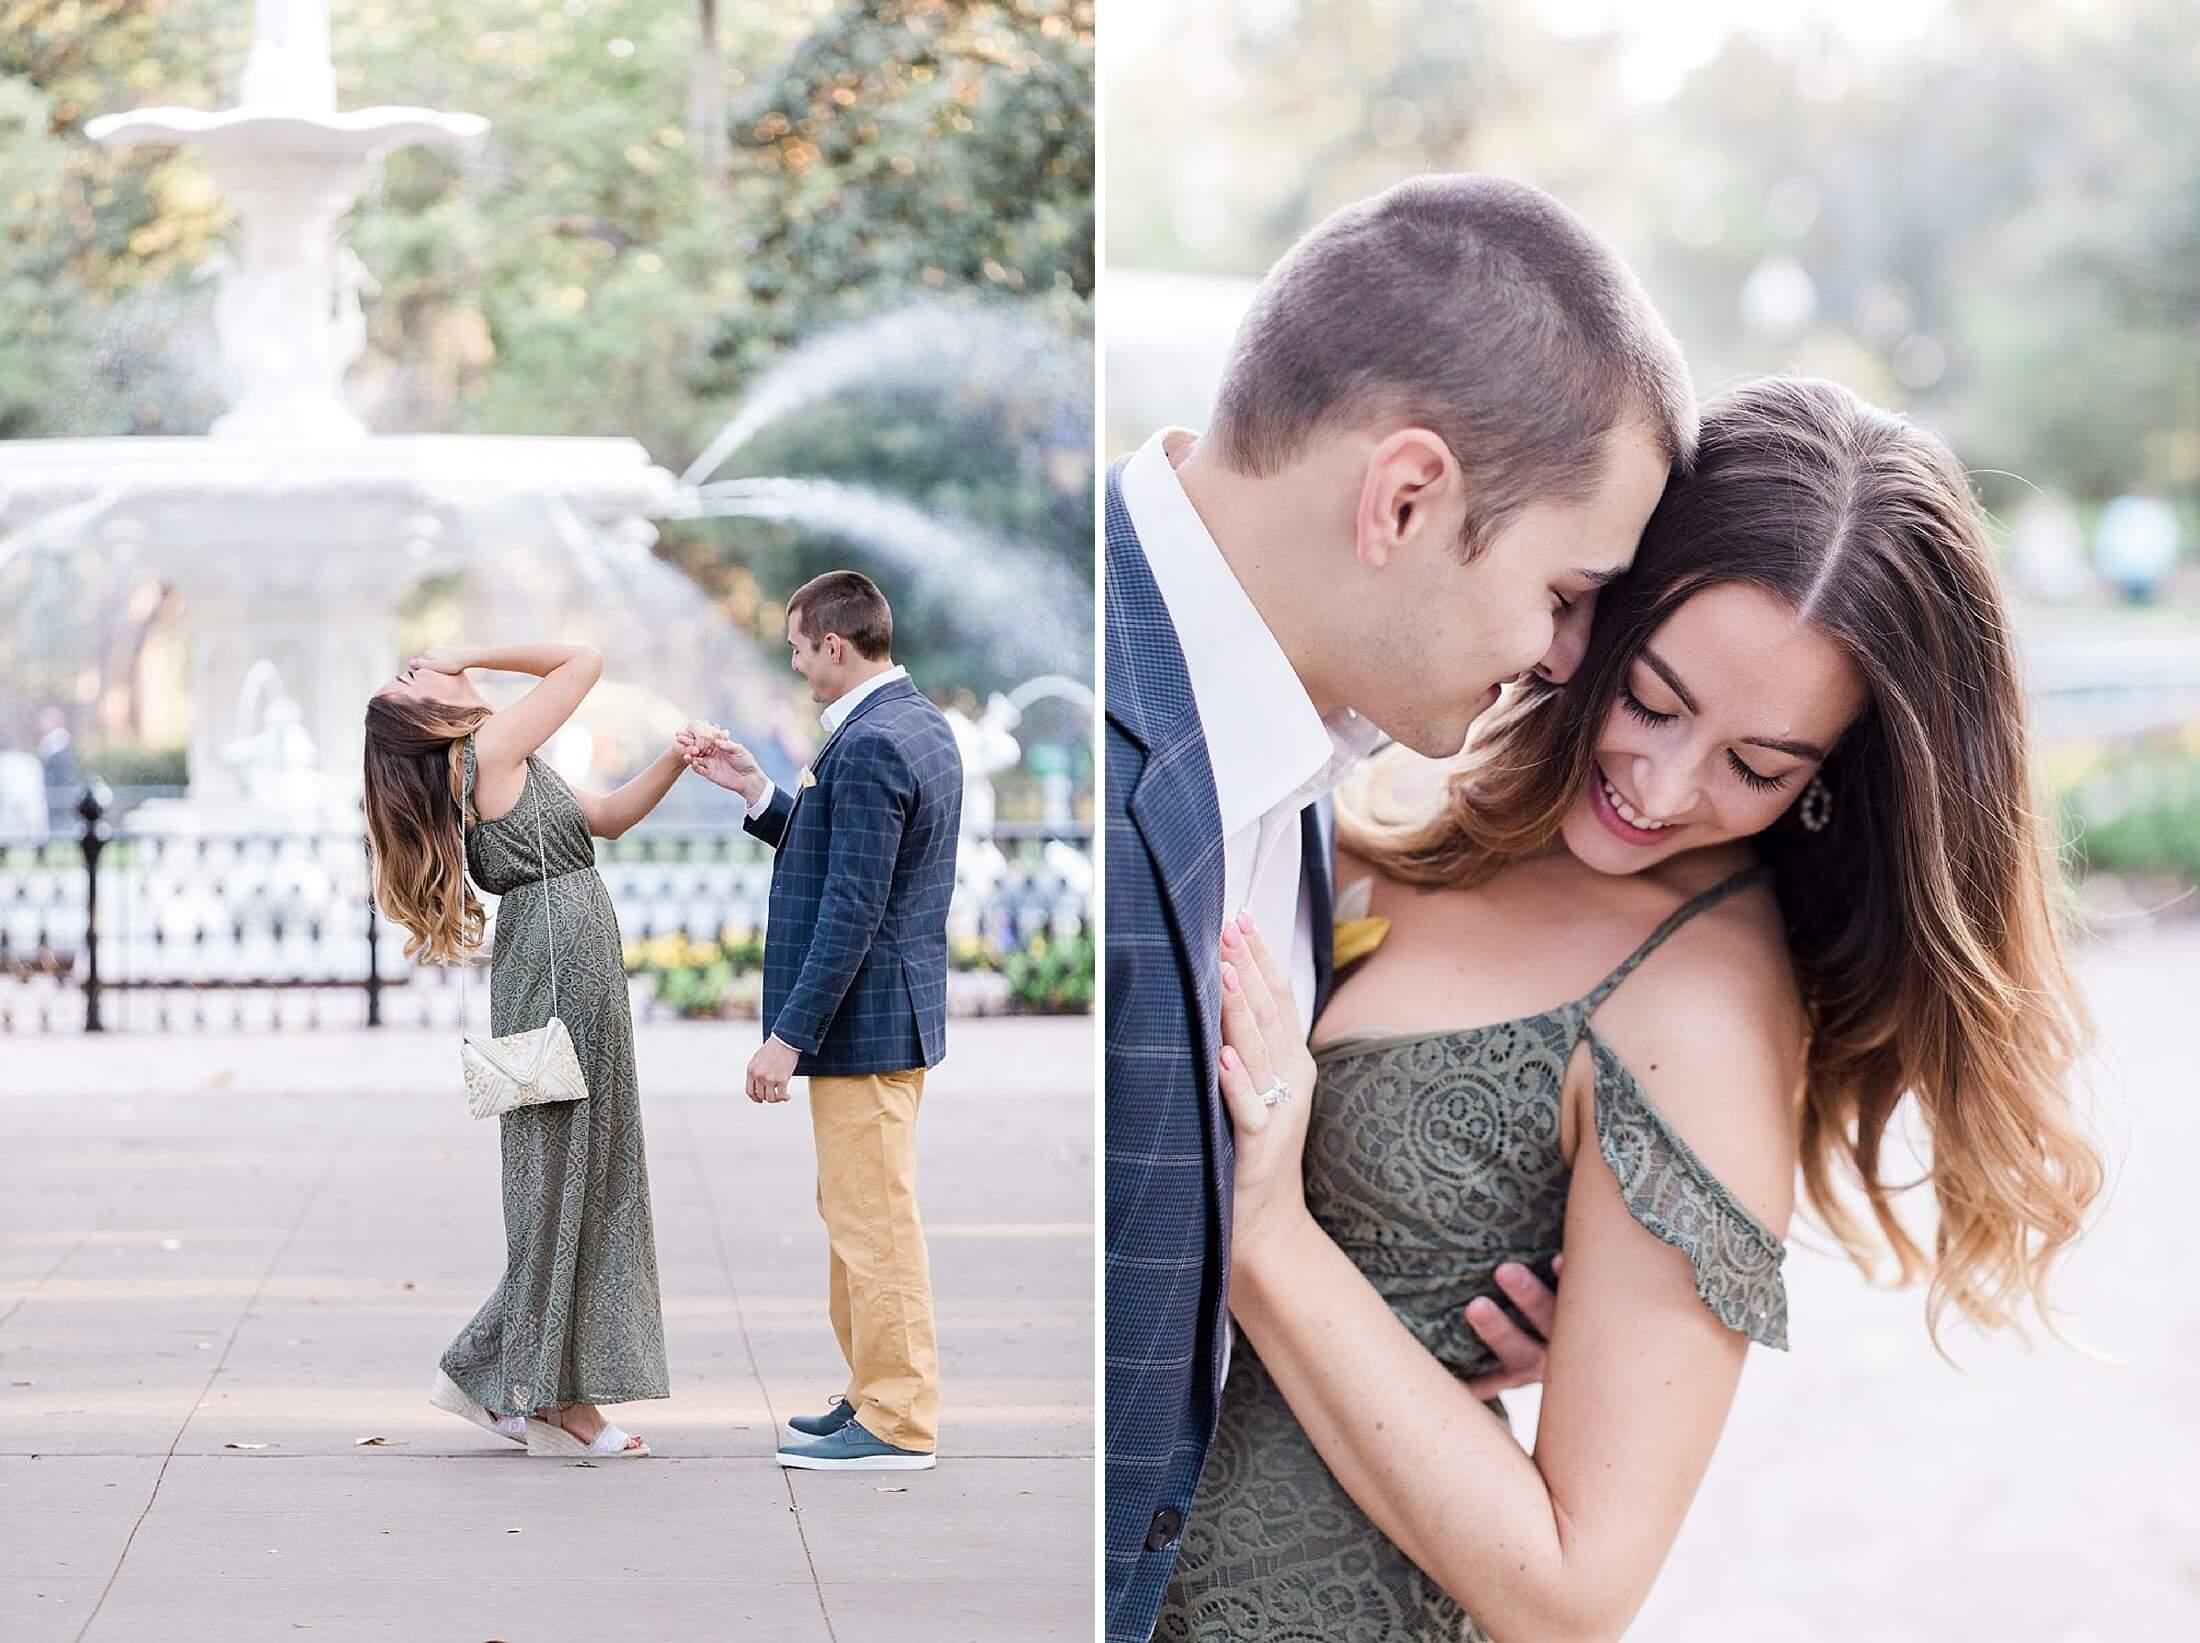 Apt-b-photography-savannah-proposal-photographer-savannah-wedding-forsyth-fountain-proposal-03.jpg